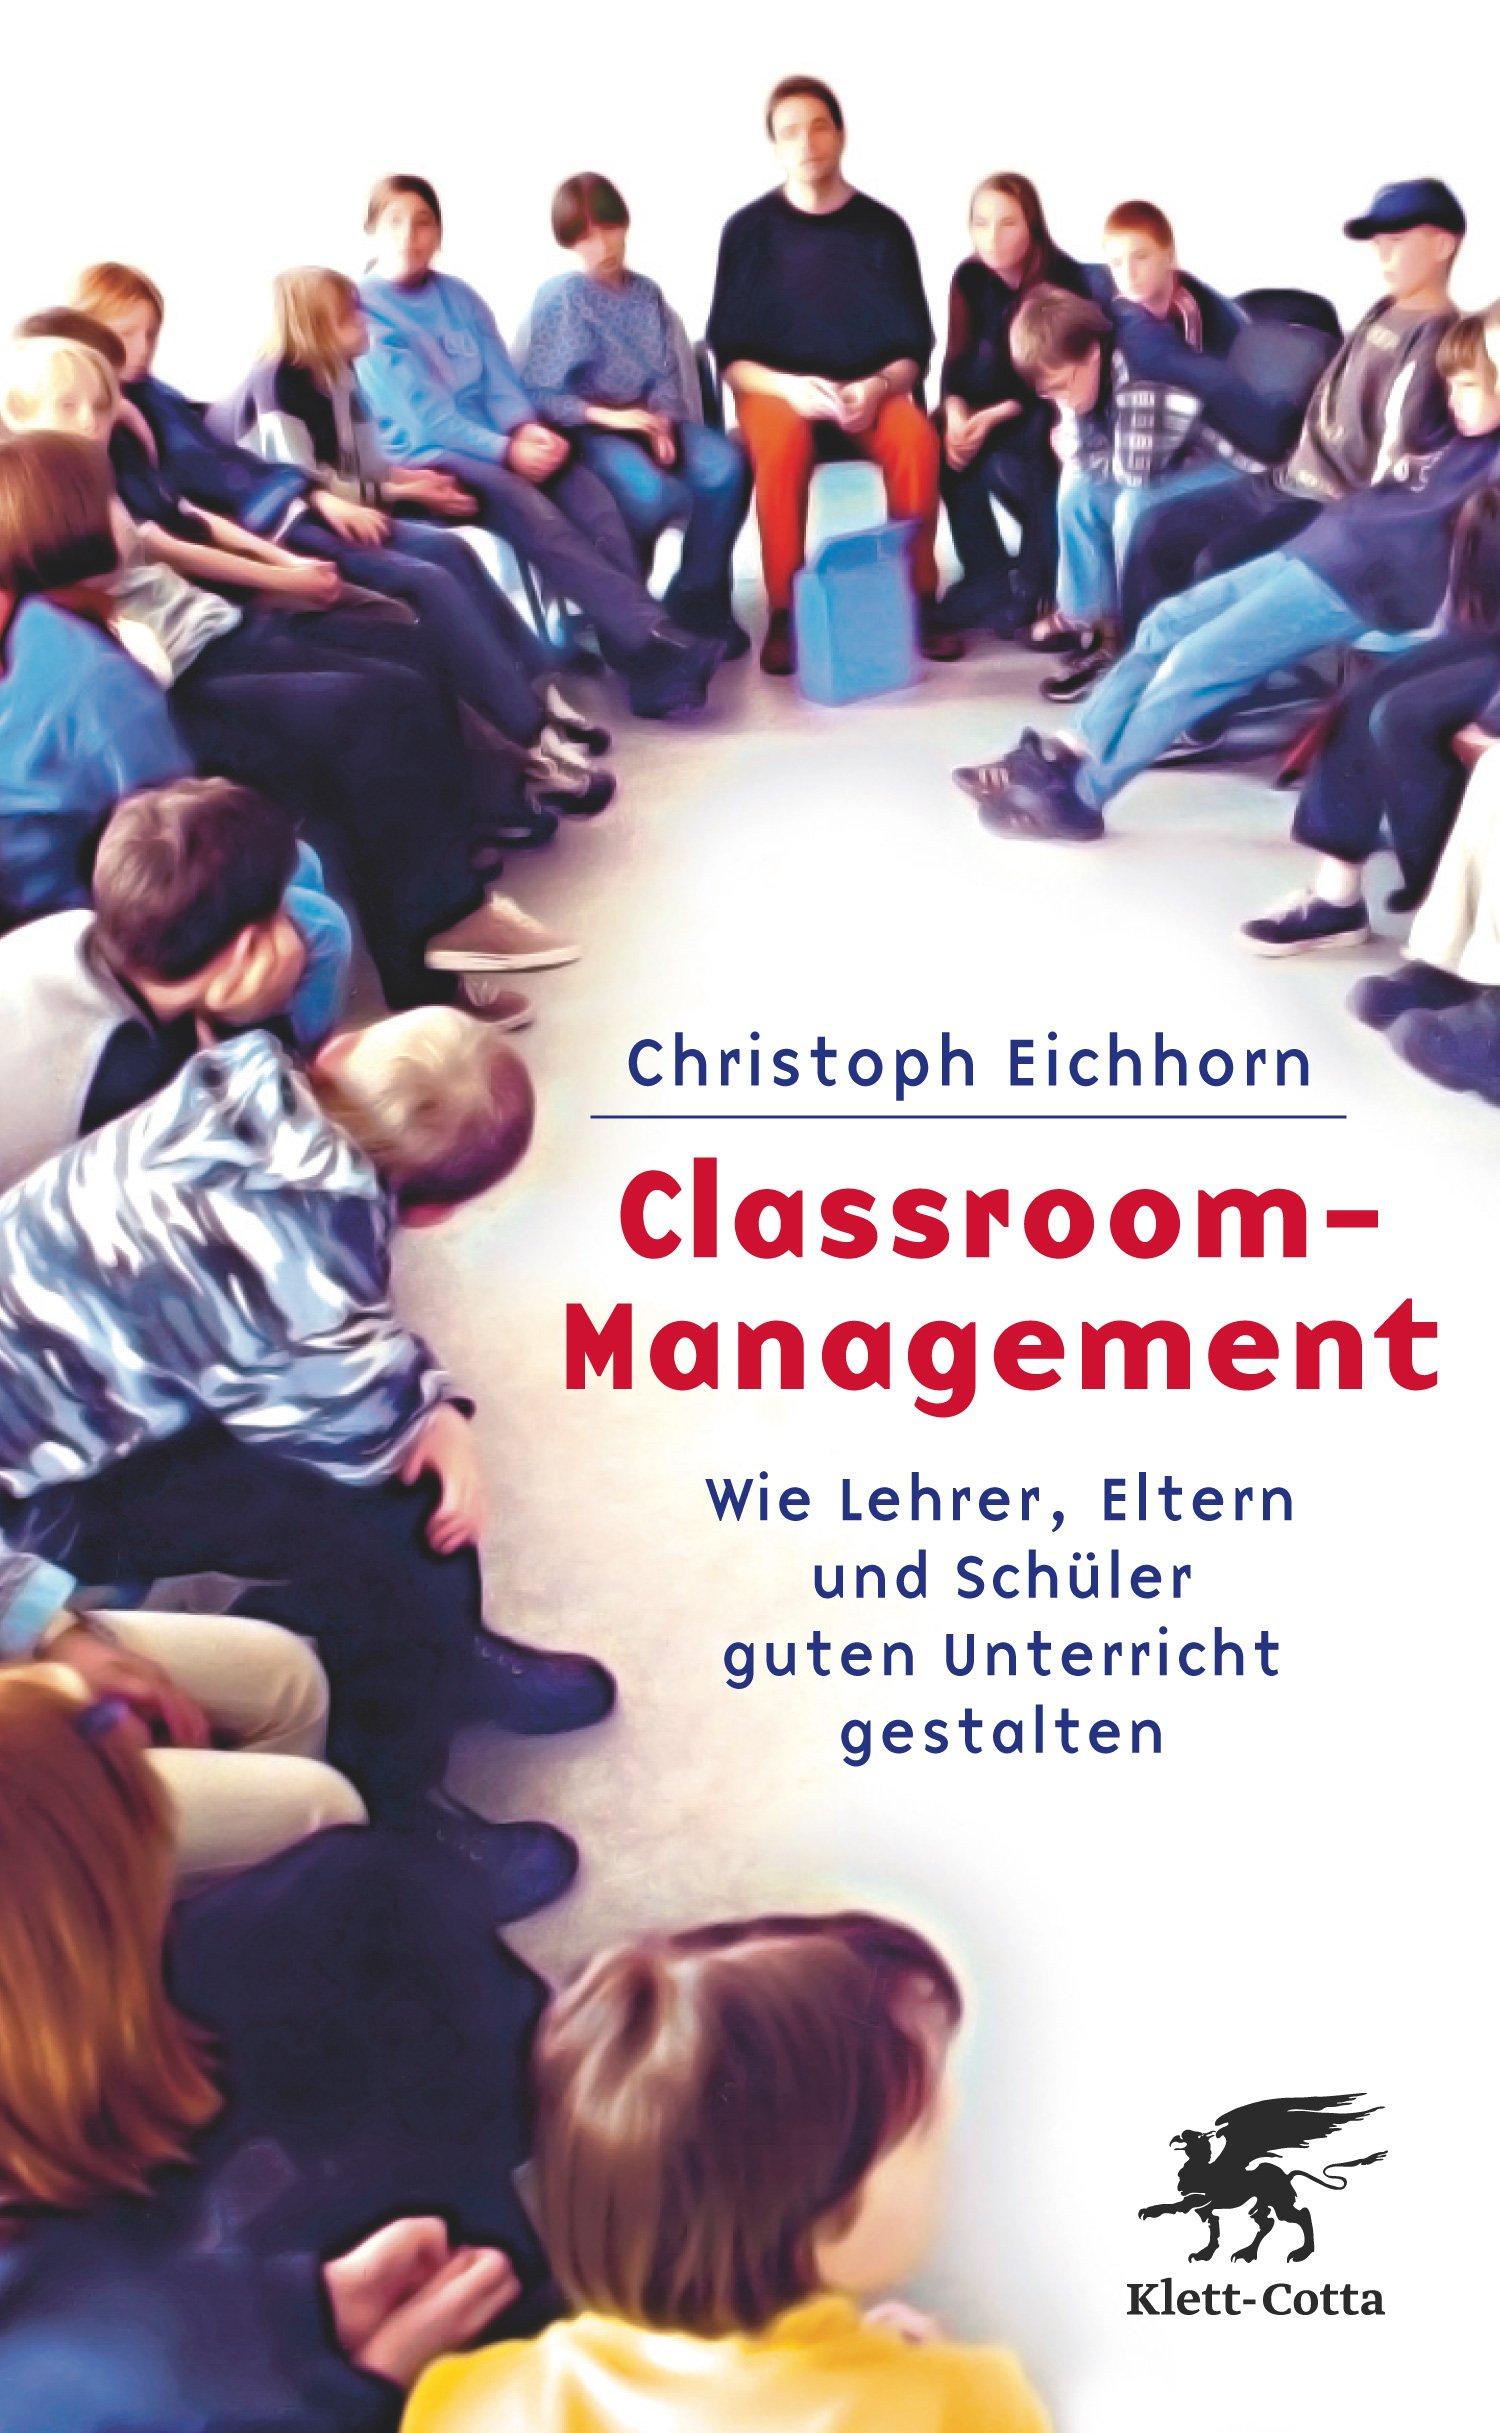 Ratgeber-Lehrkraefte Classroom-Management